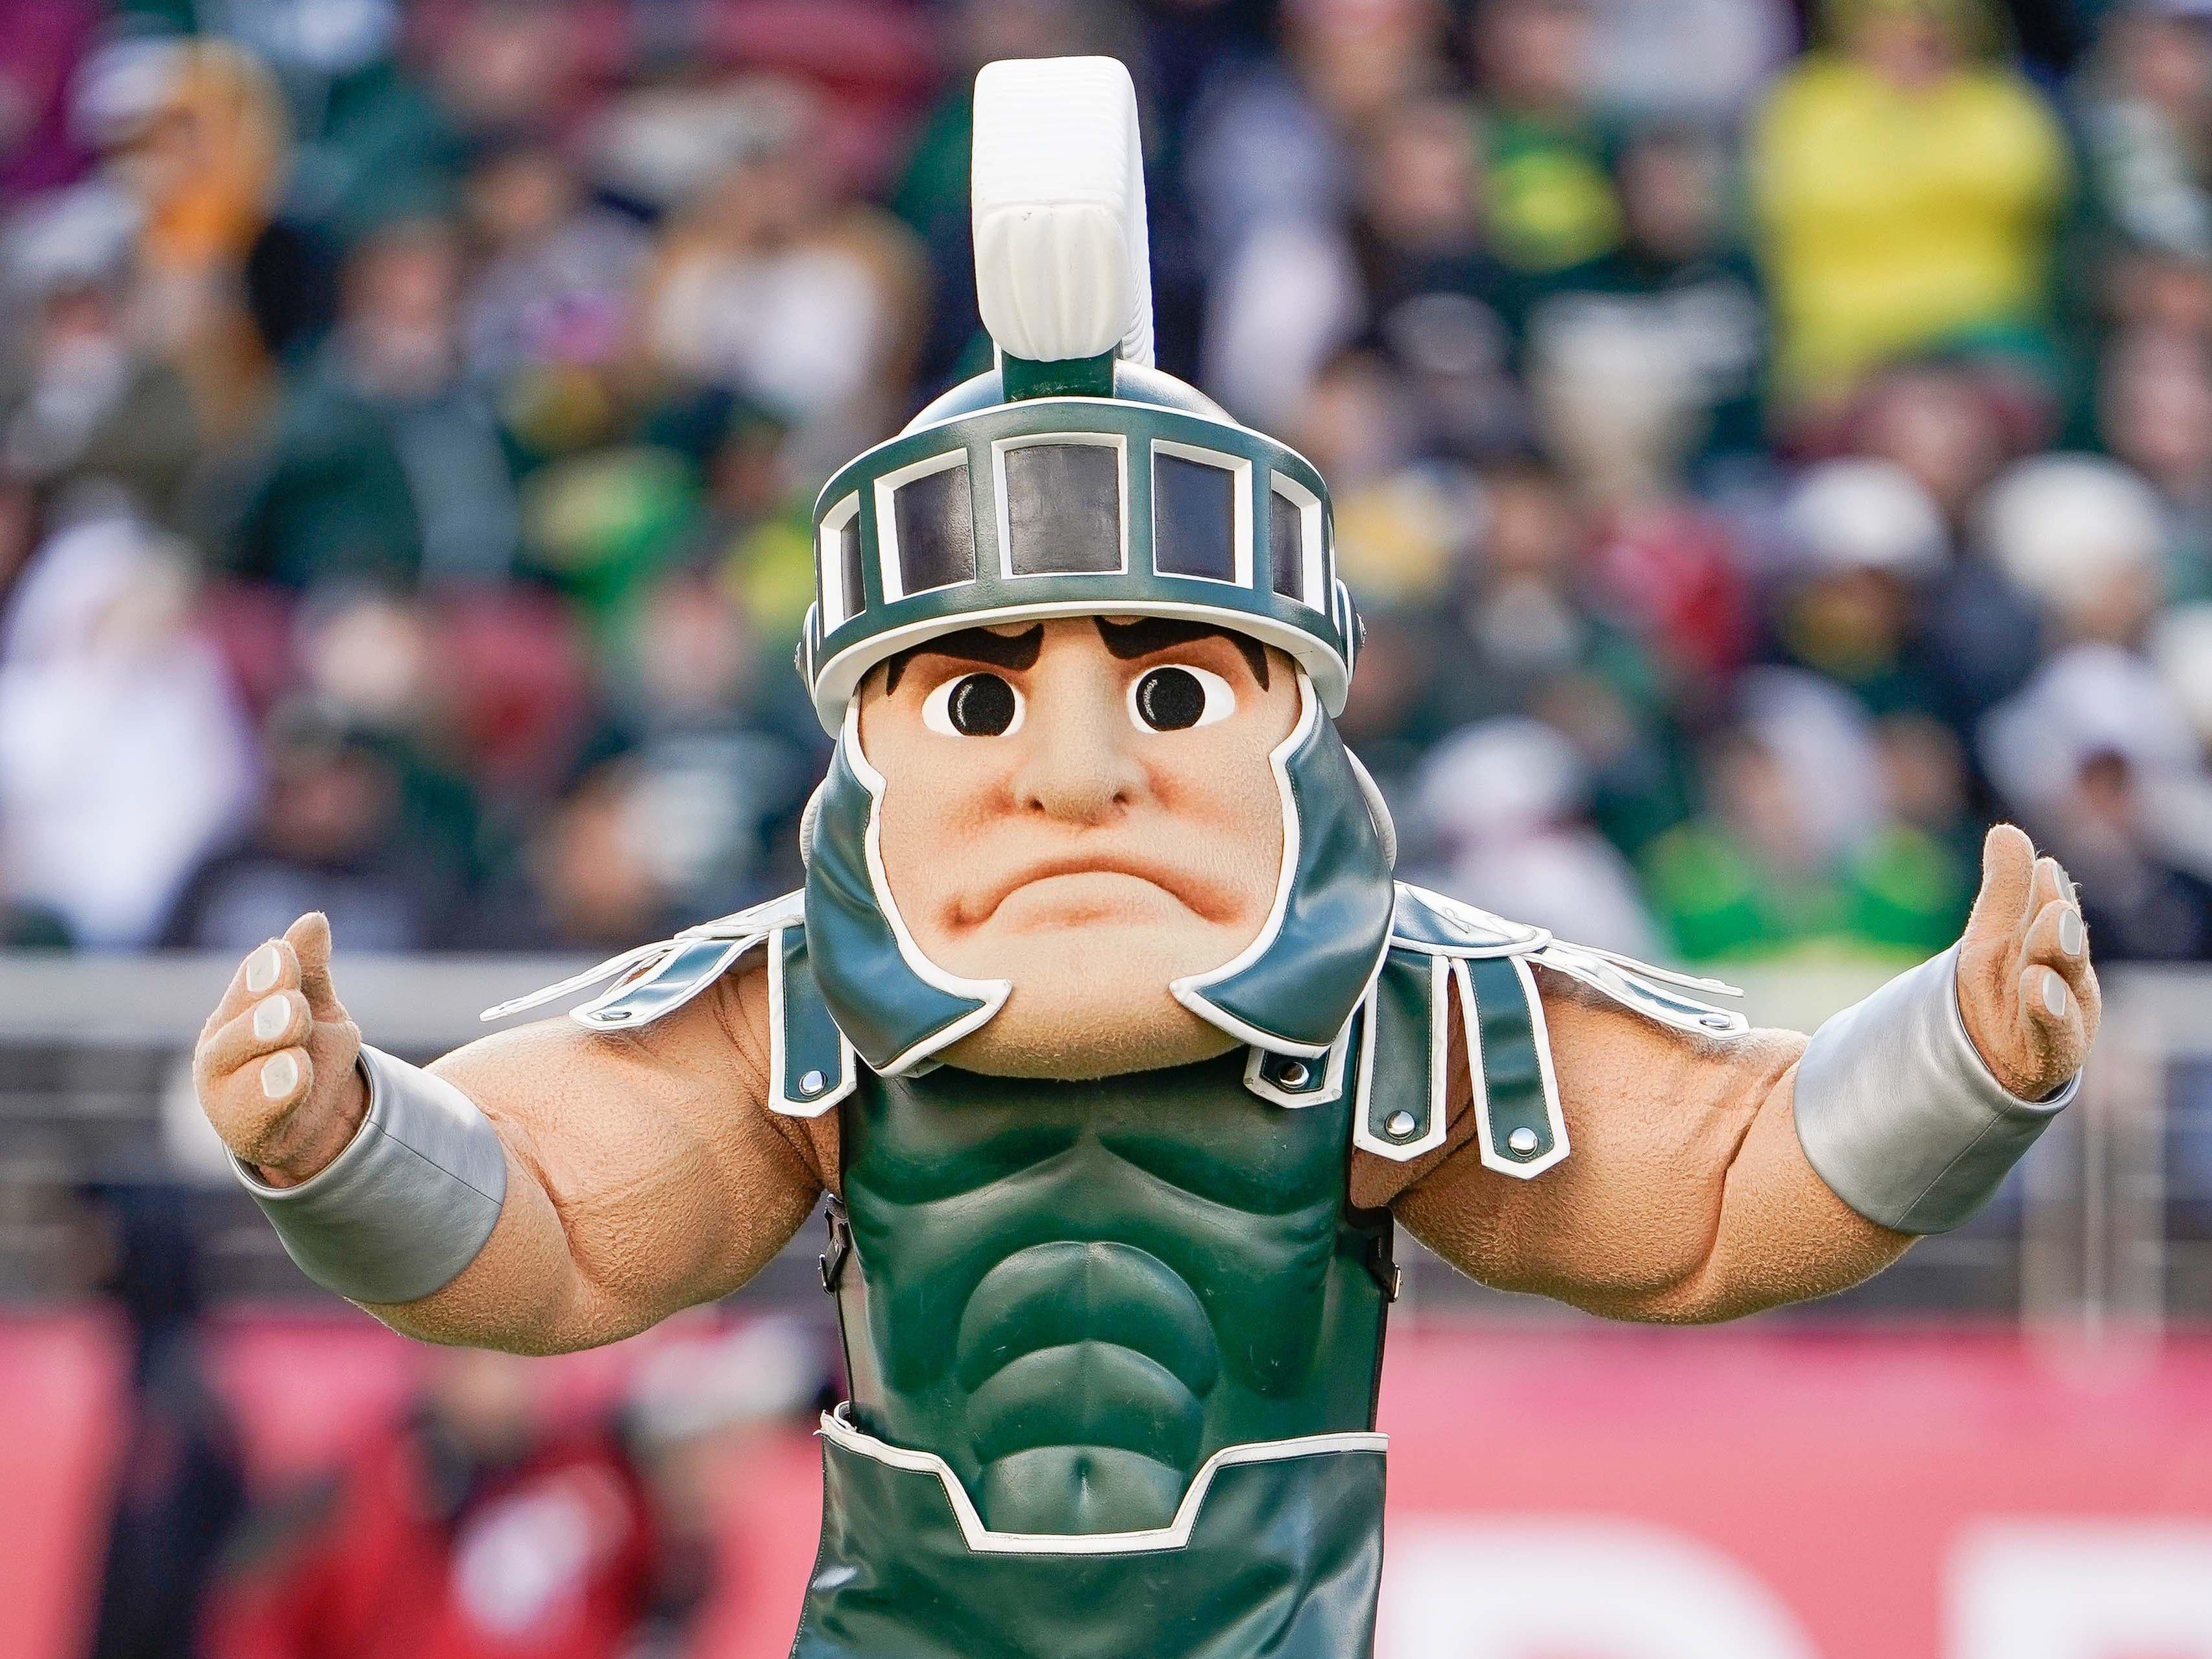 Michigan State Spartans mascot performs during the third quarter against the Oregon Ducks at Levi's Stadium.